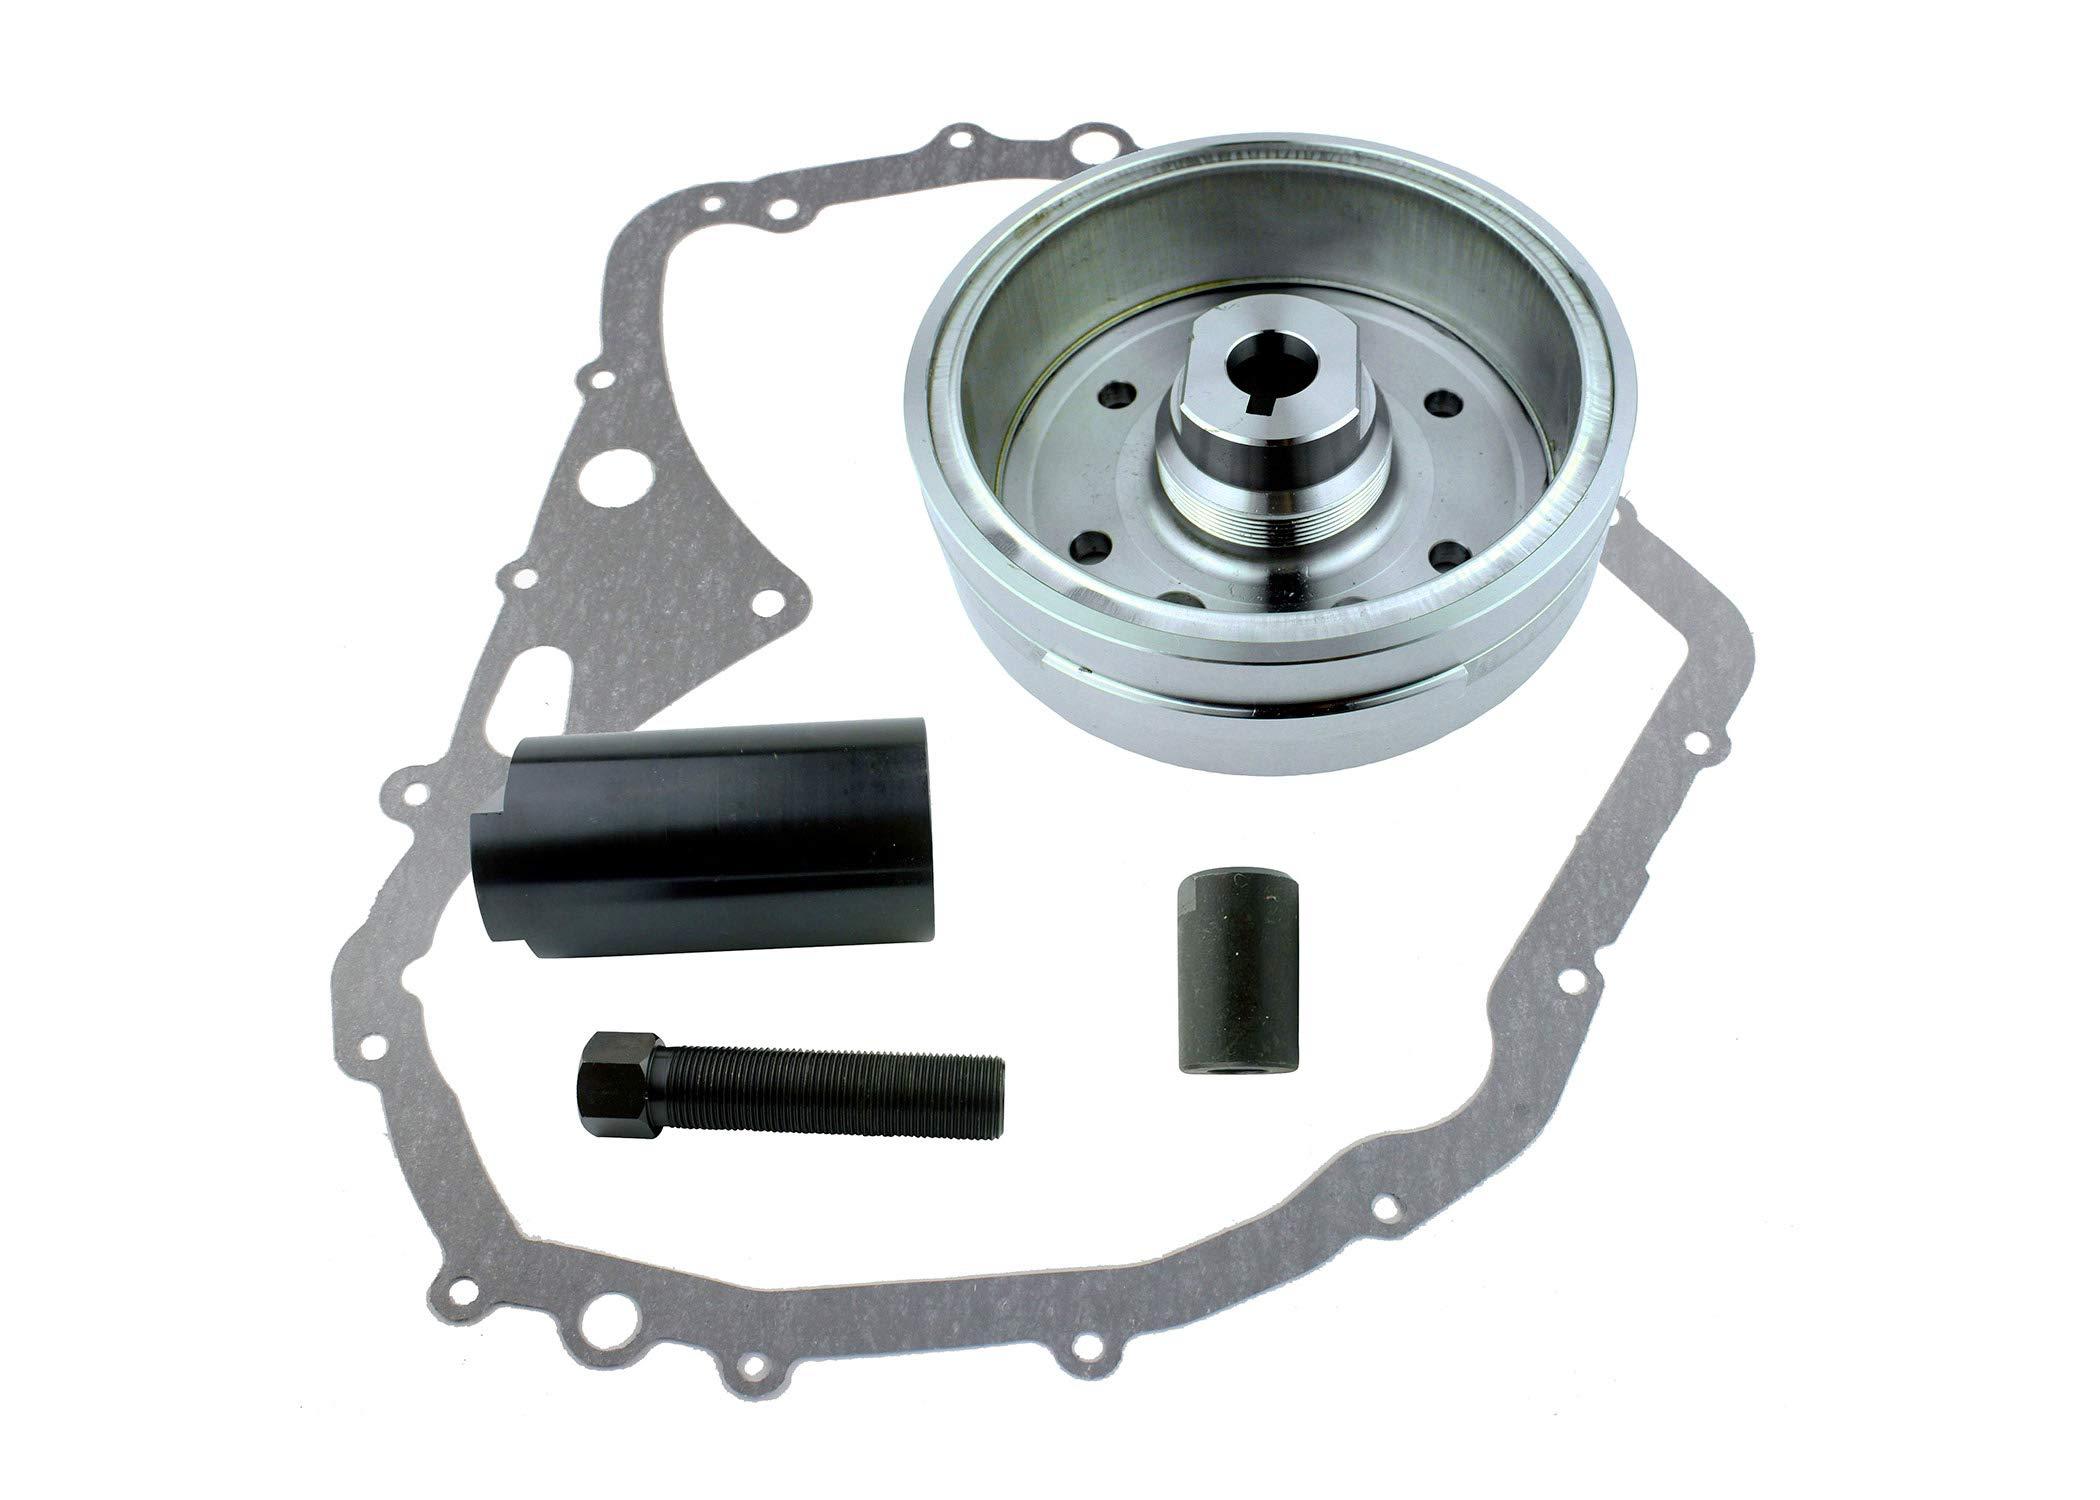 Kit Improved Flywheel + Flywheel Puller + Gasket For Suzuki LTF 400 Eiger 2002-2007 Arctic Cat 400 Manual 2003 2004 2005 2006 2007 2008